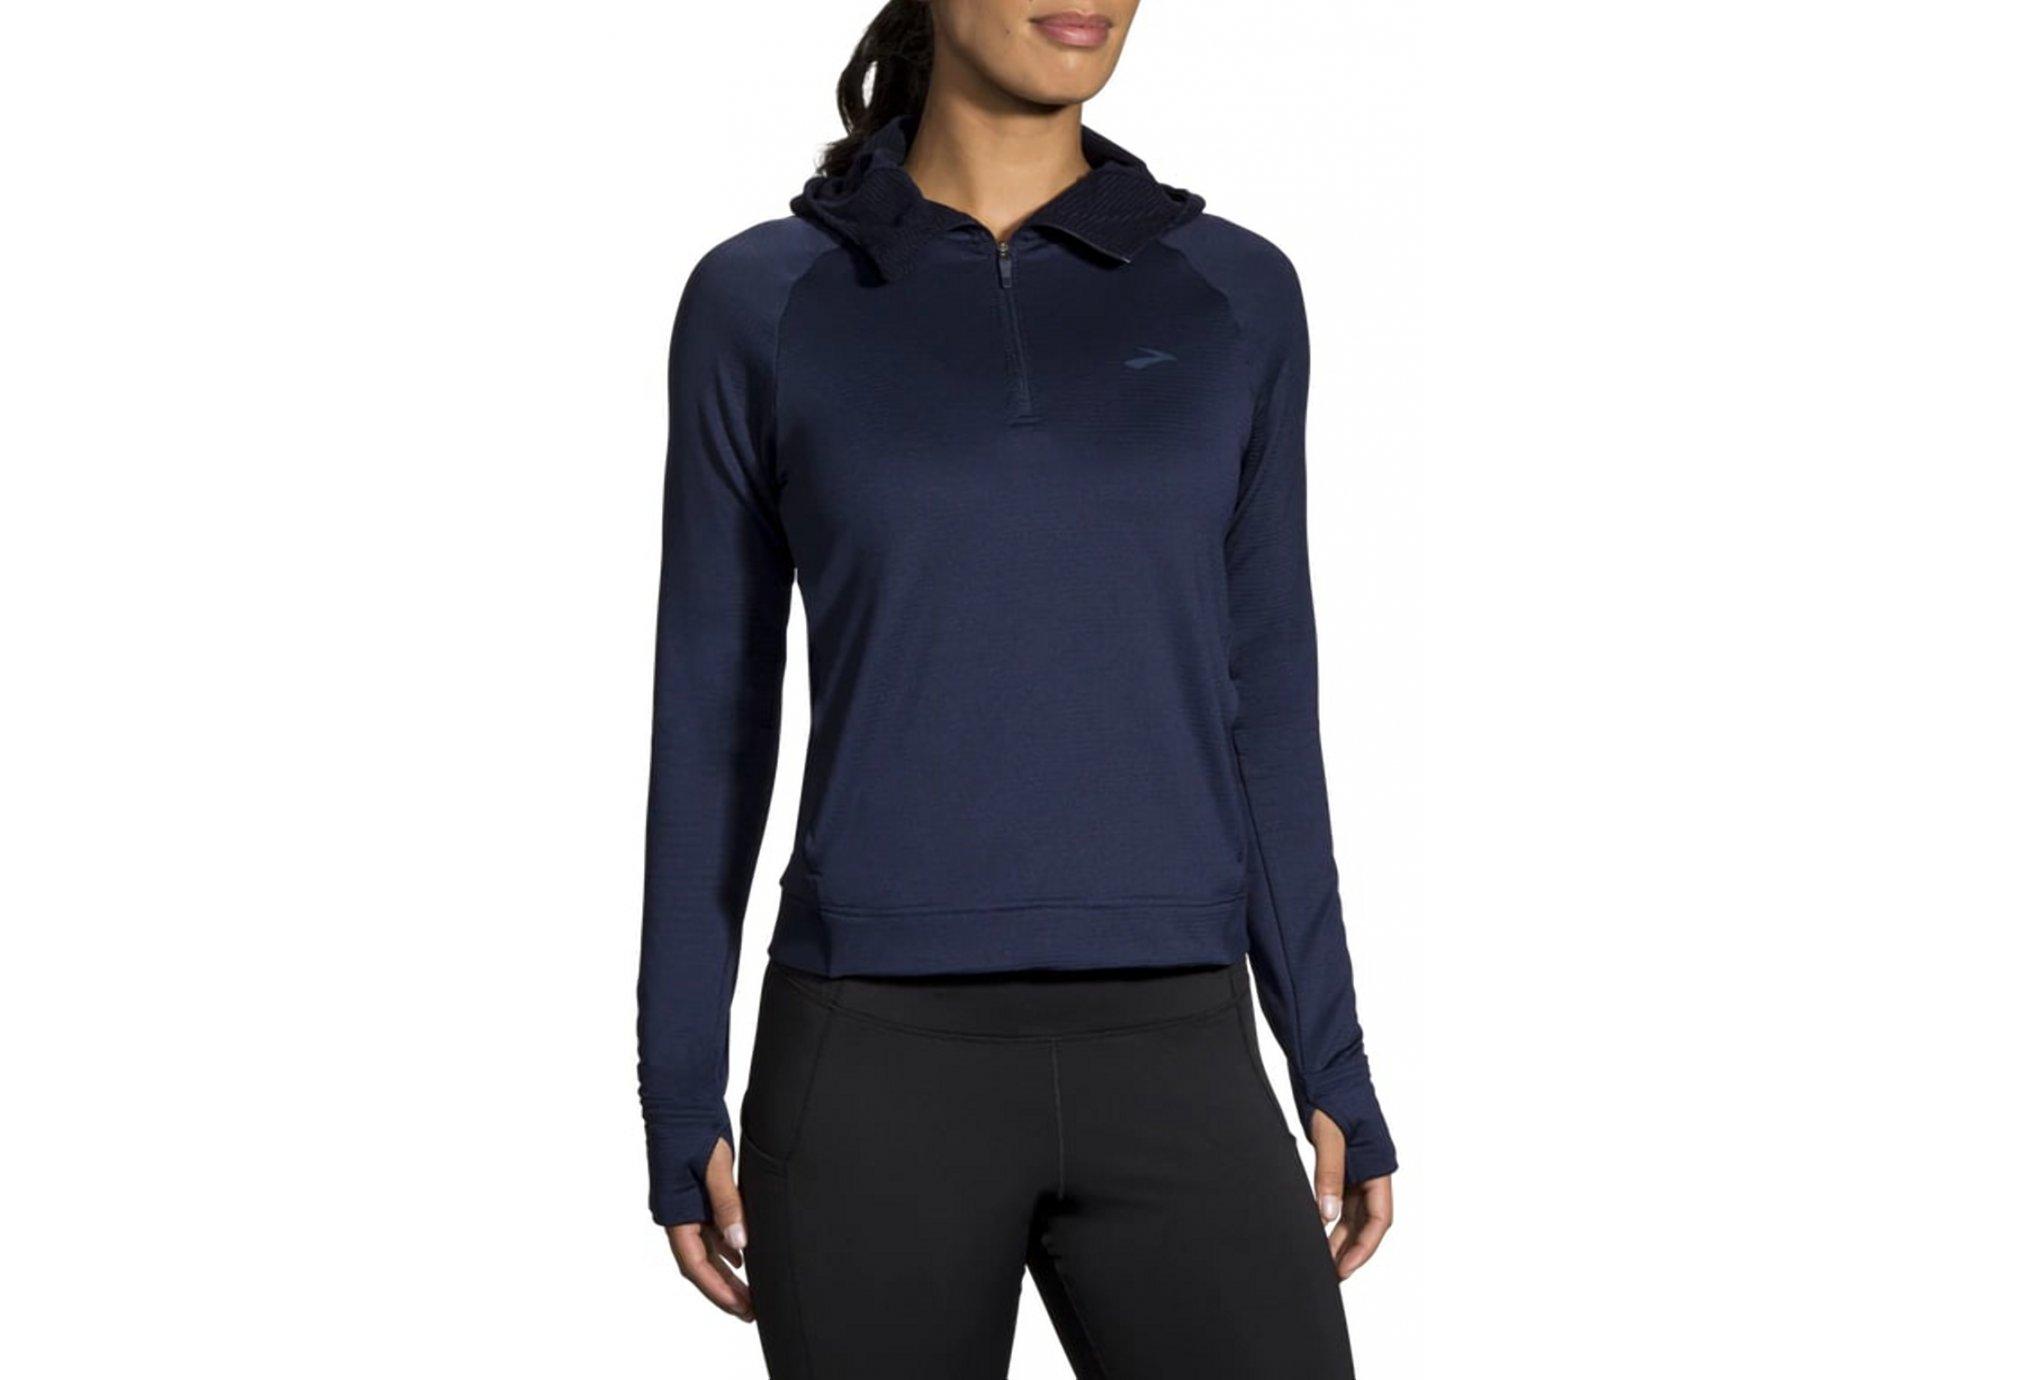 Brooks Notch Thermal W vêtement running femme